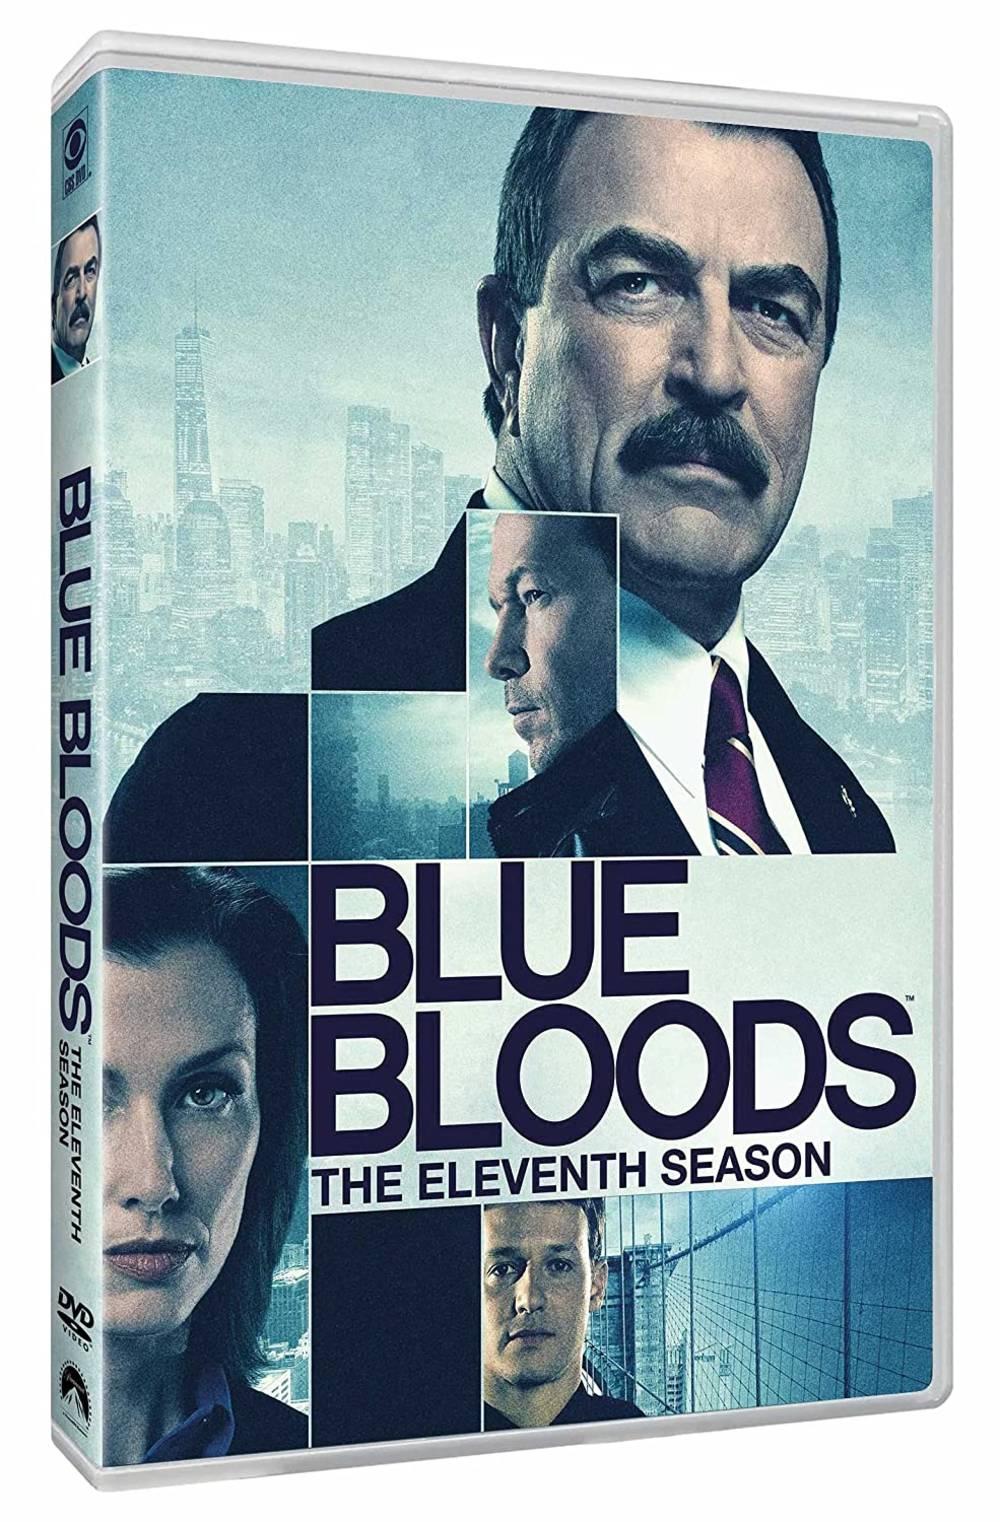 Blue Bloods [TV Series] - Blue Bloods: The Eleventh Season